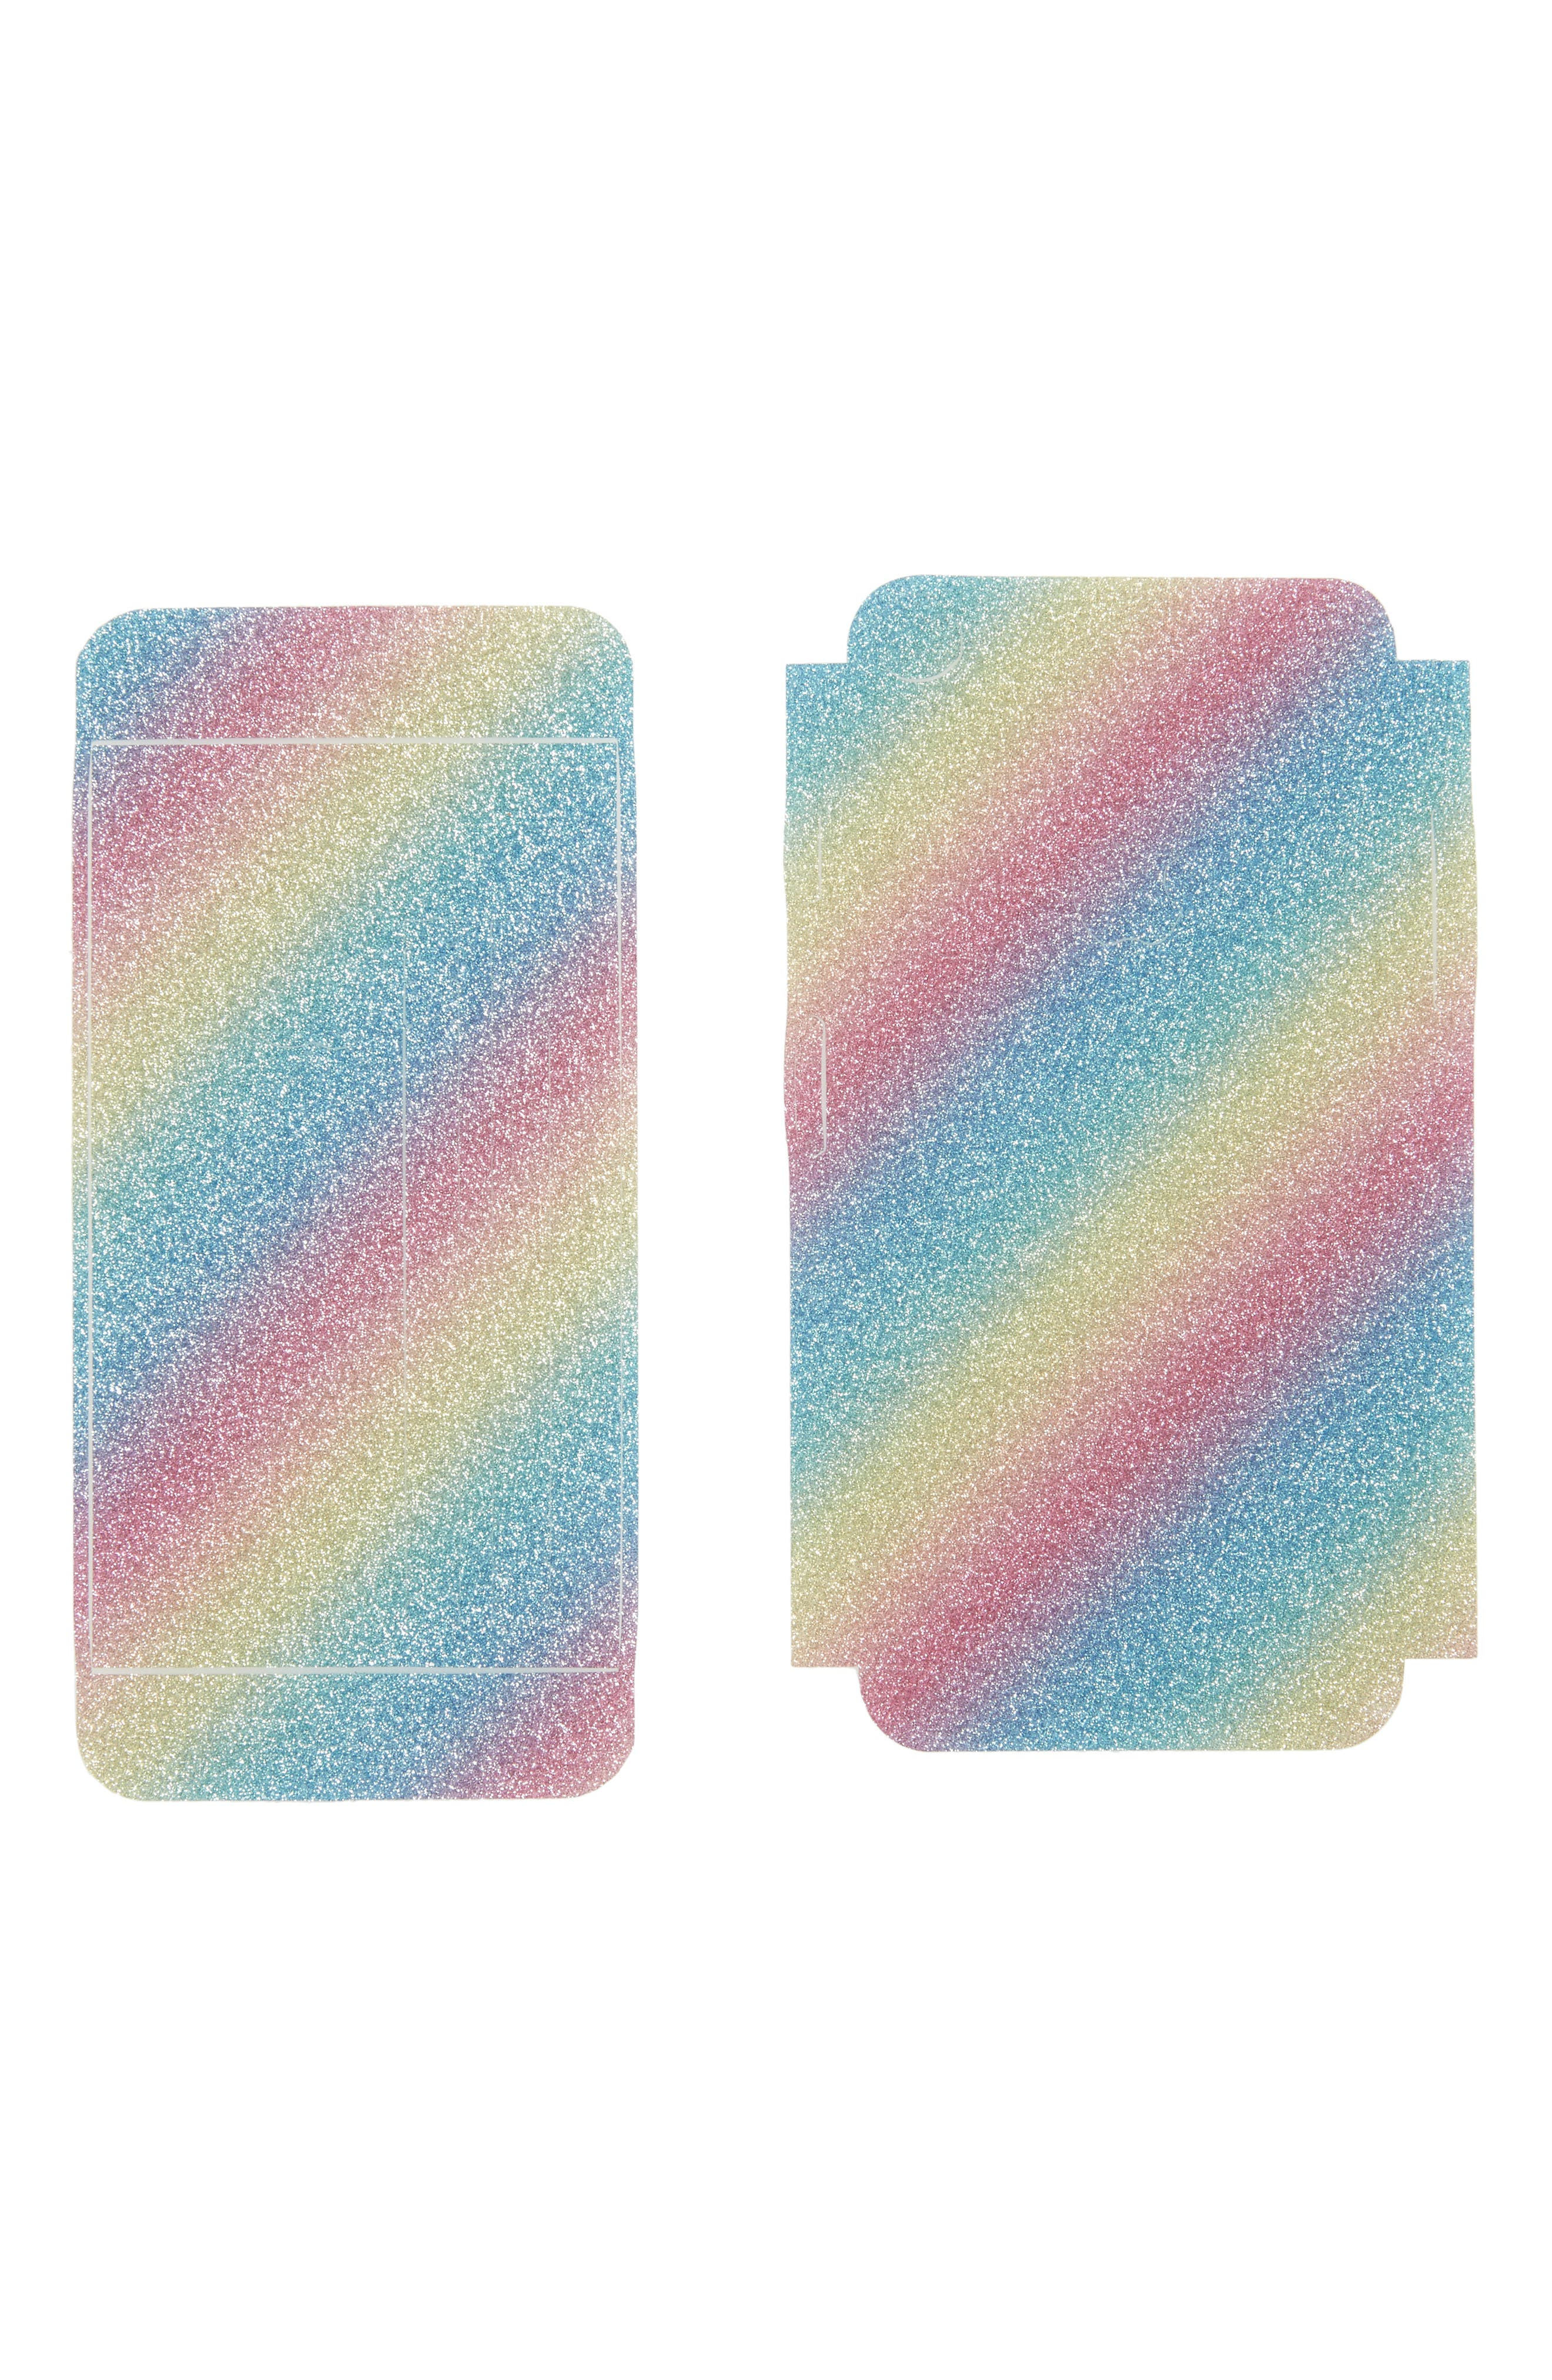 VELVET CAVIAR Rainbow Glitter iPhone 7 Decal